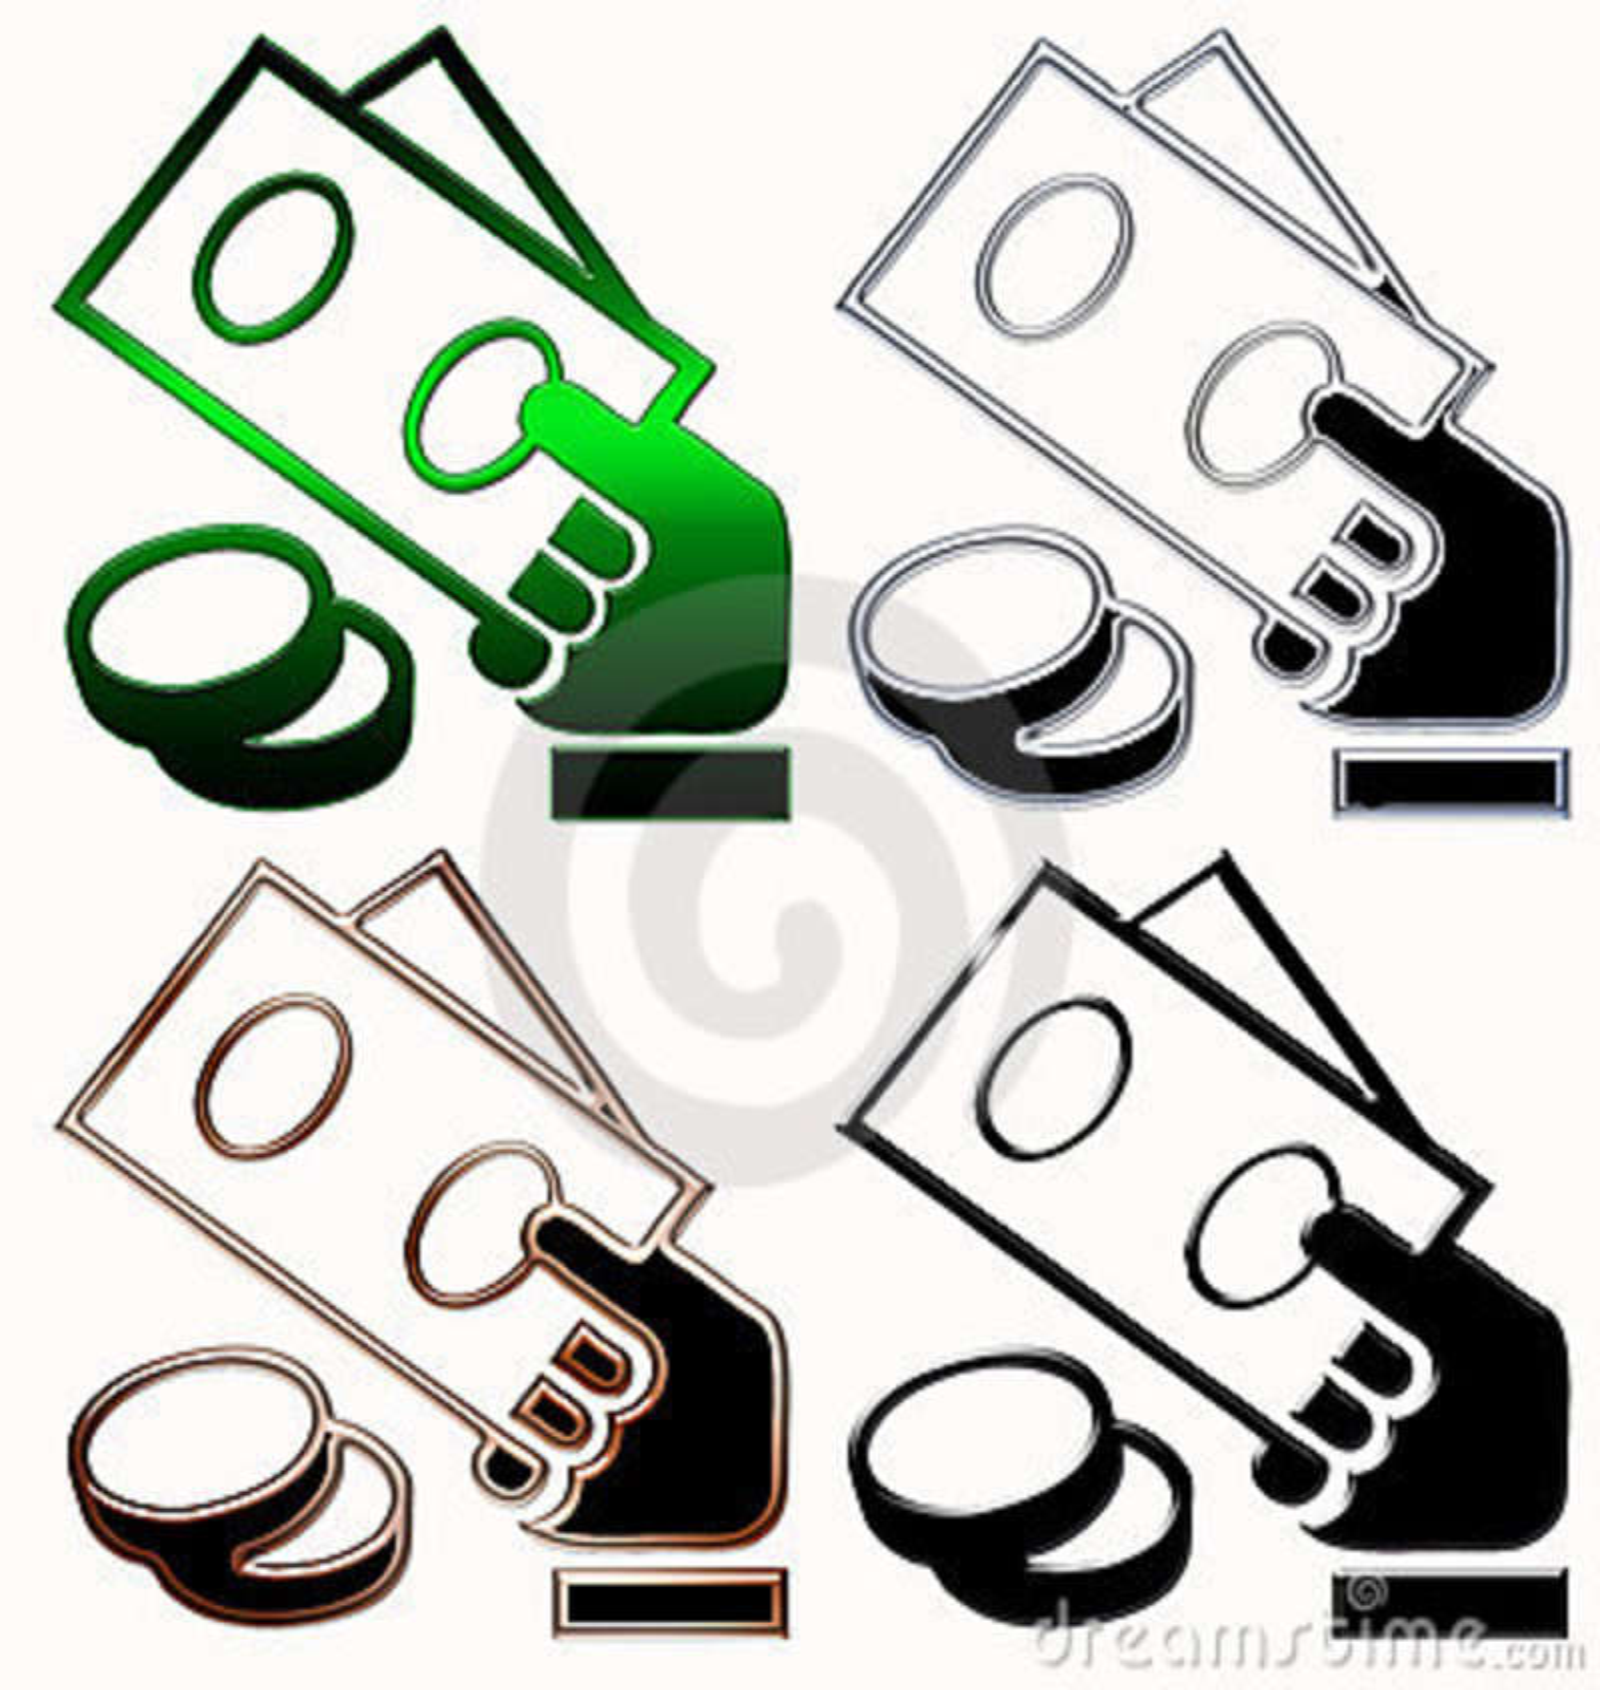 Money Cash Symbols Stock Images - Image: 6808314